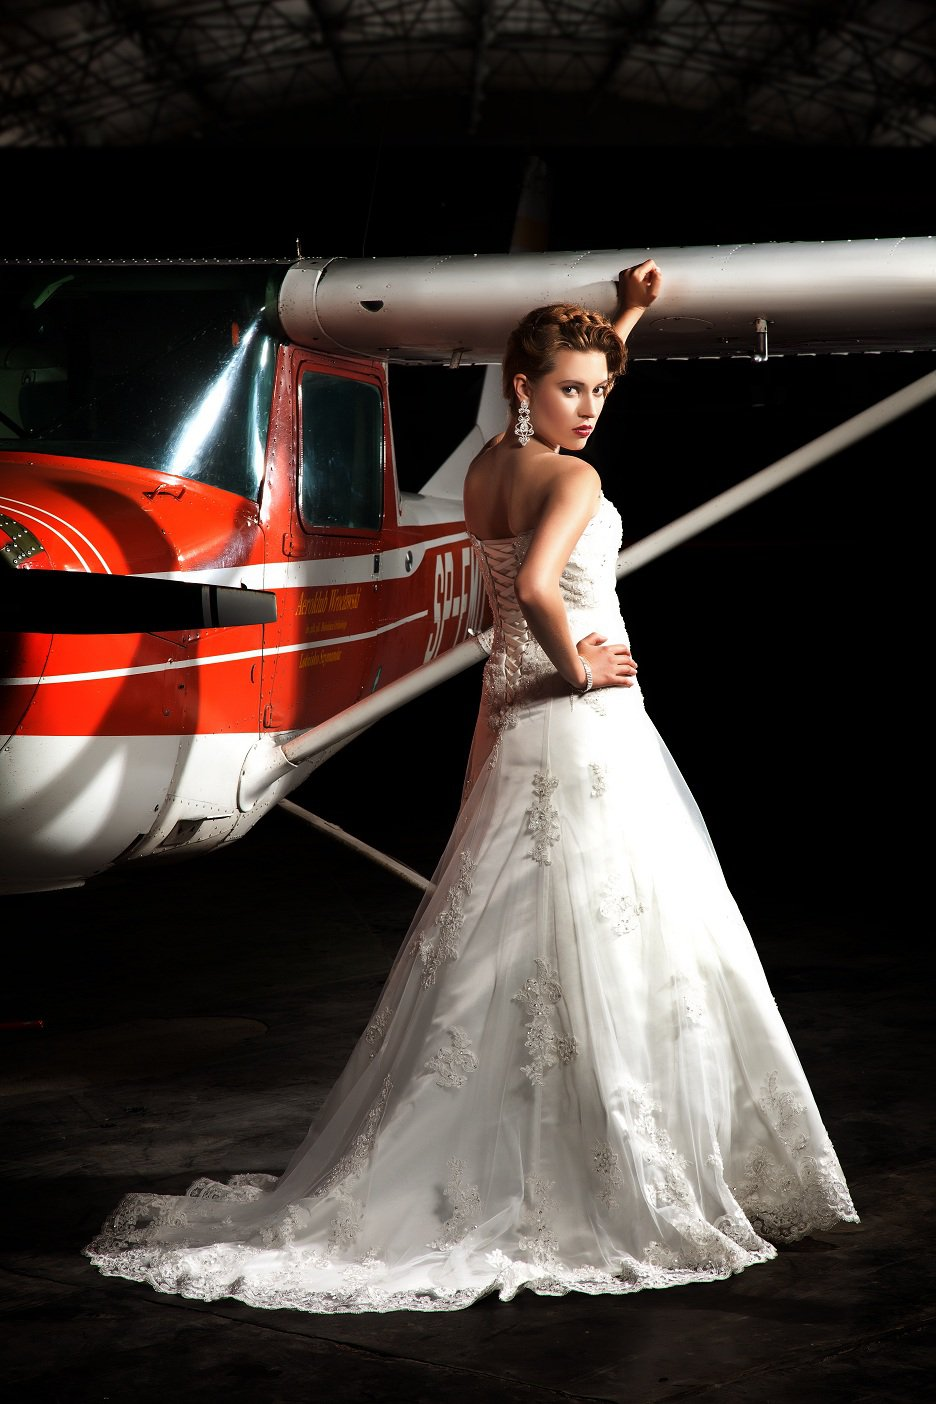 Emporia suknia ślubna - Suknie ślubne